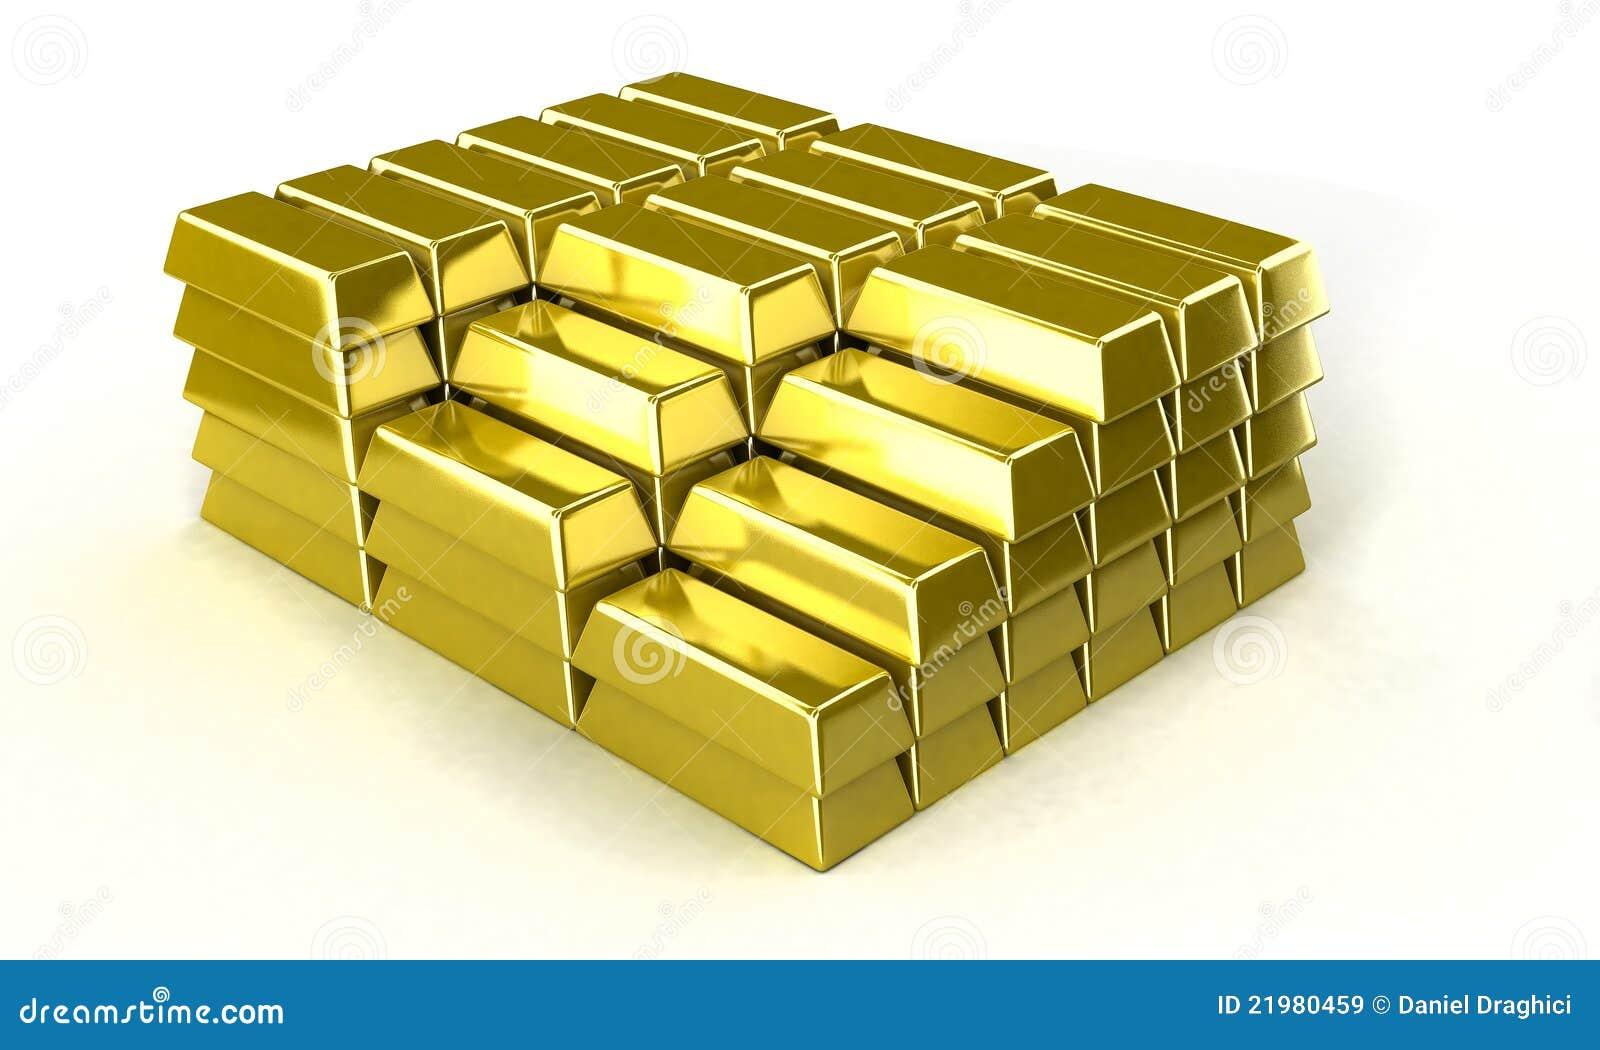 Gold Ingot Royalty Free Stock Images Image 21980459